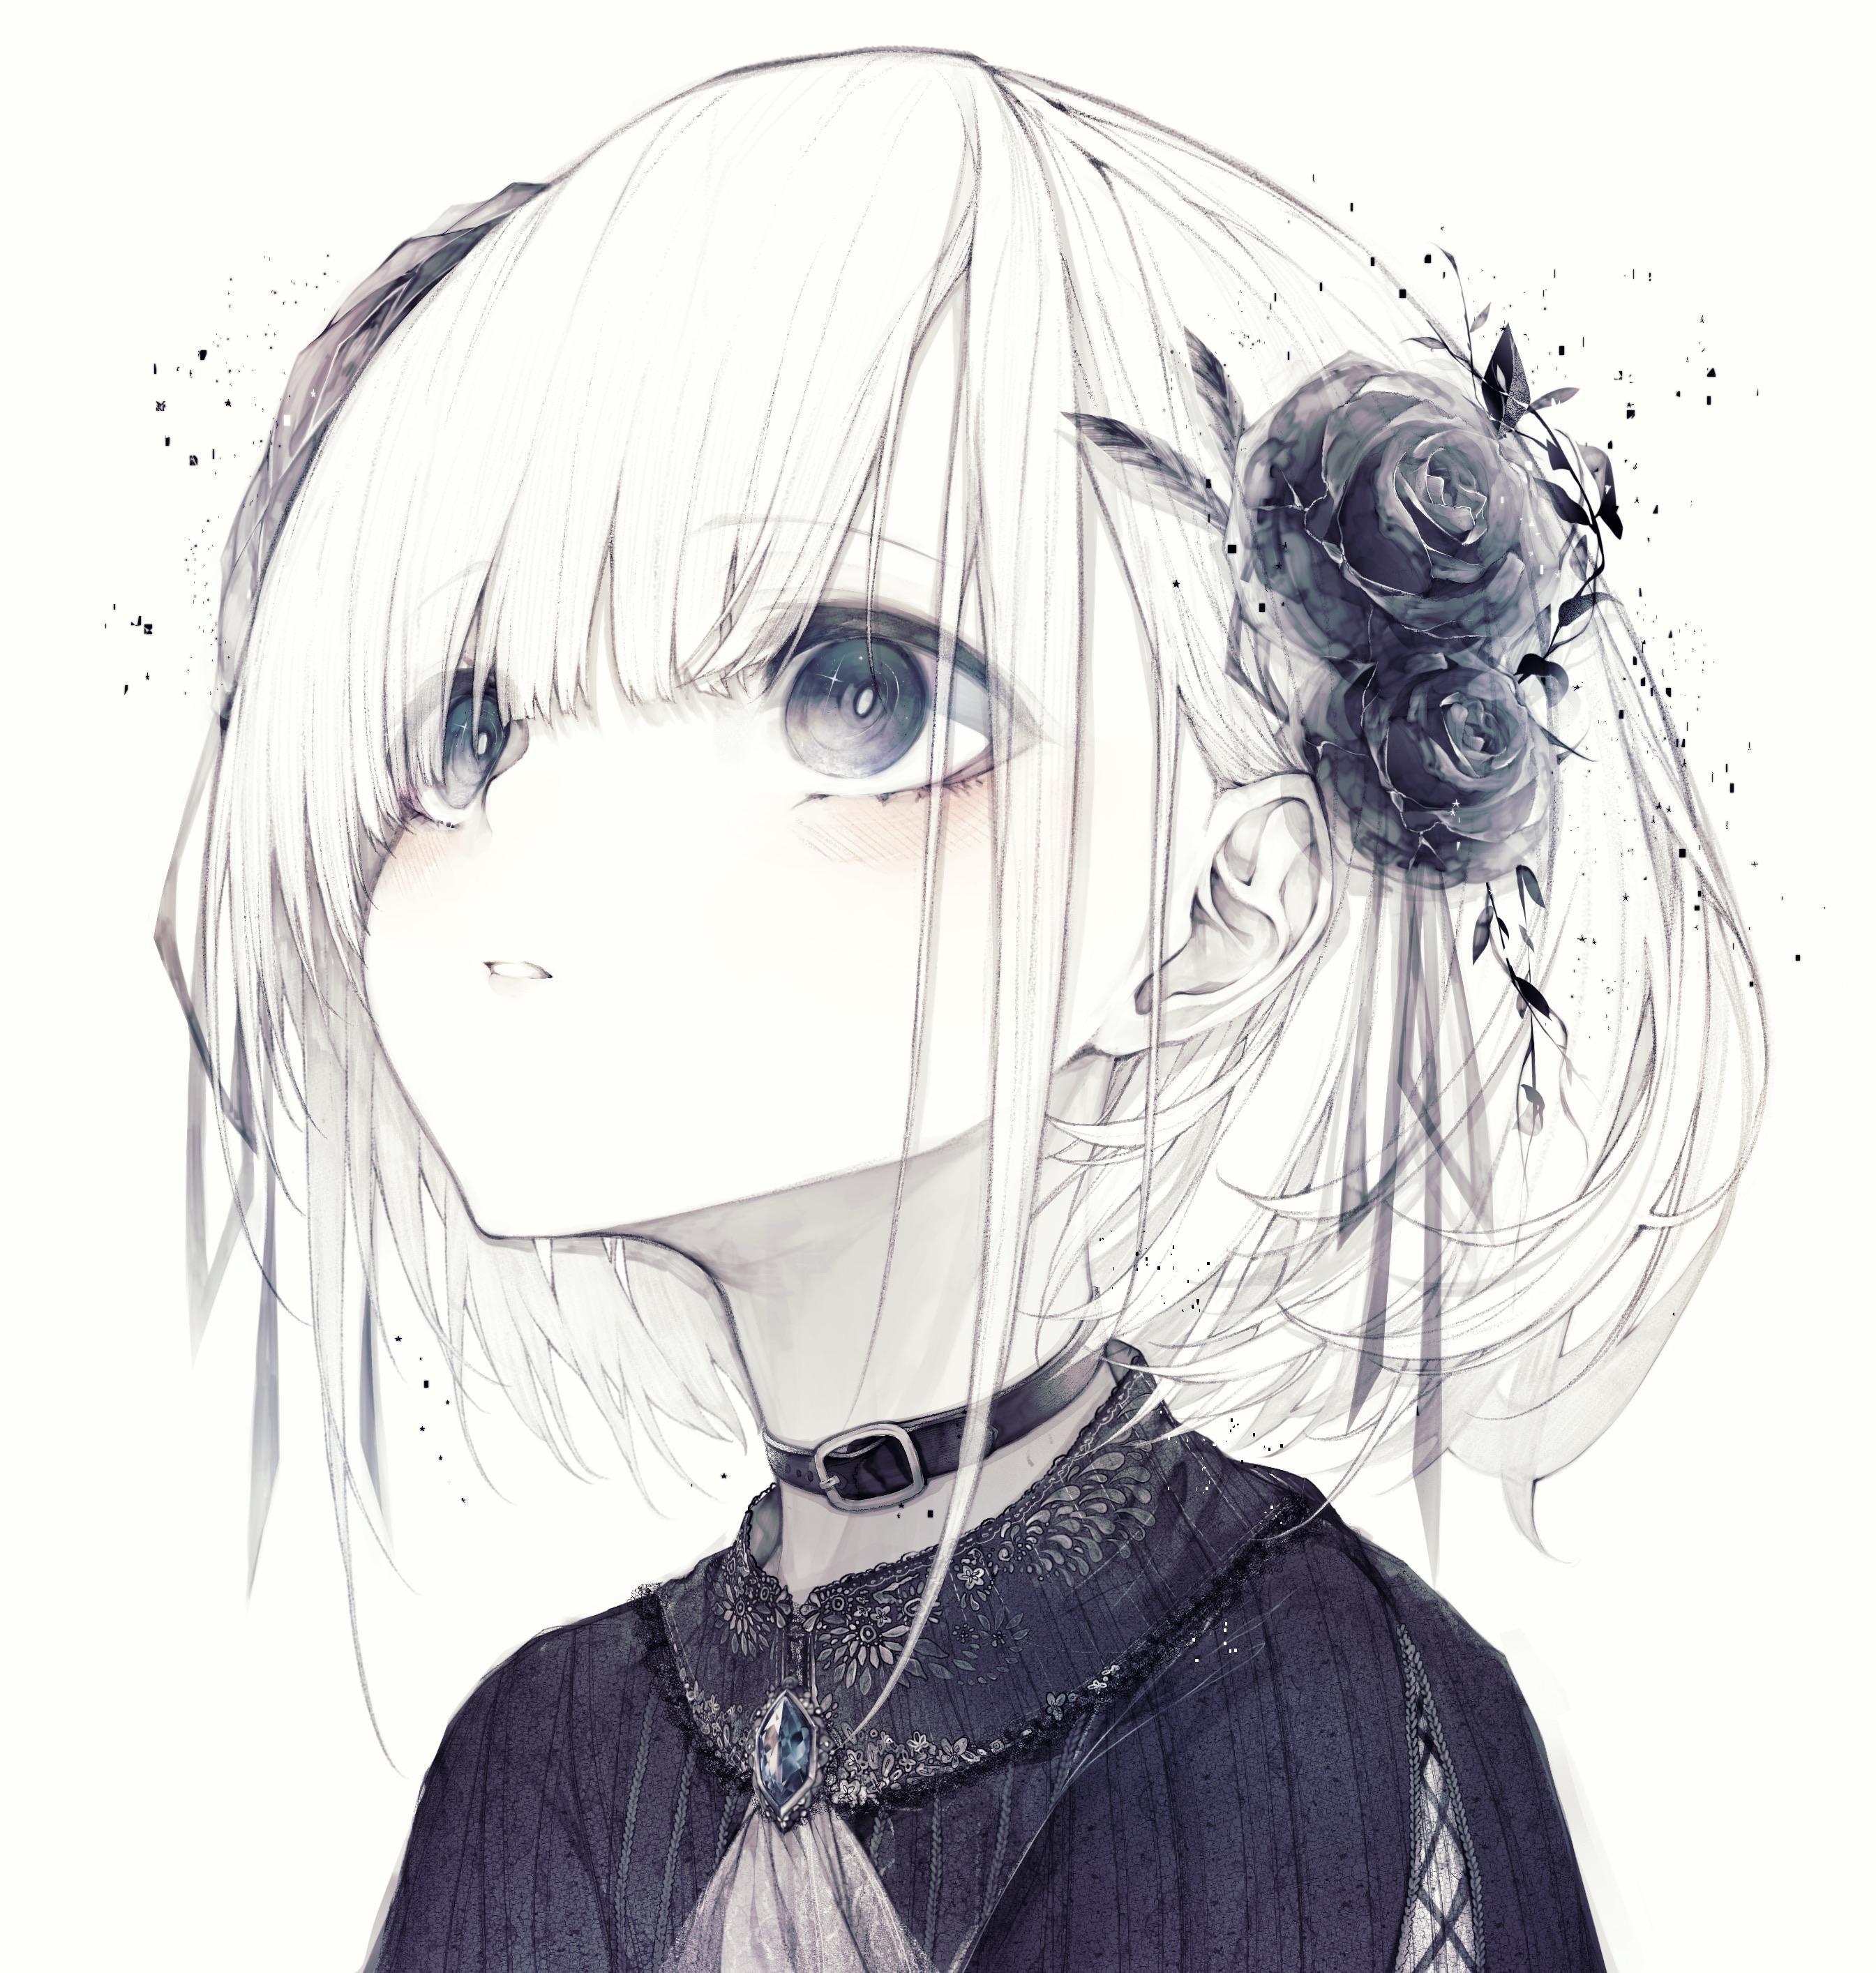 Black And White Looking Up Cutely Original Anime Art Girl Anime Artwork Kawaii Anime